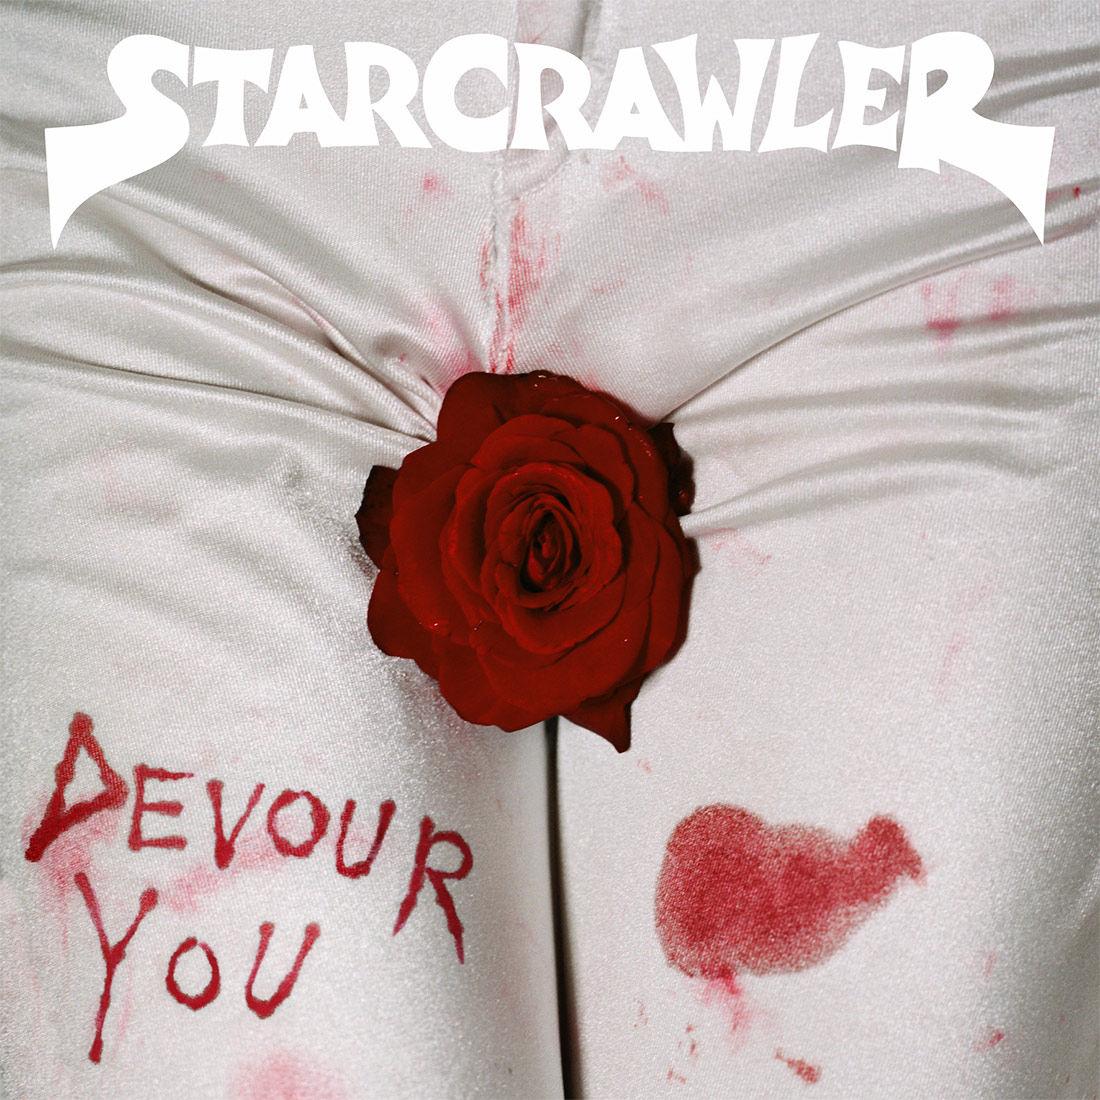 Starcrawler -Devour You  Devices Used:  Hoof Reaper  /  Bit Commander  /  Park Fuzz Sound  /  Rainbow Machine